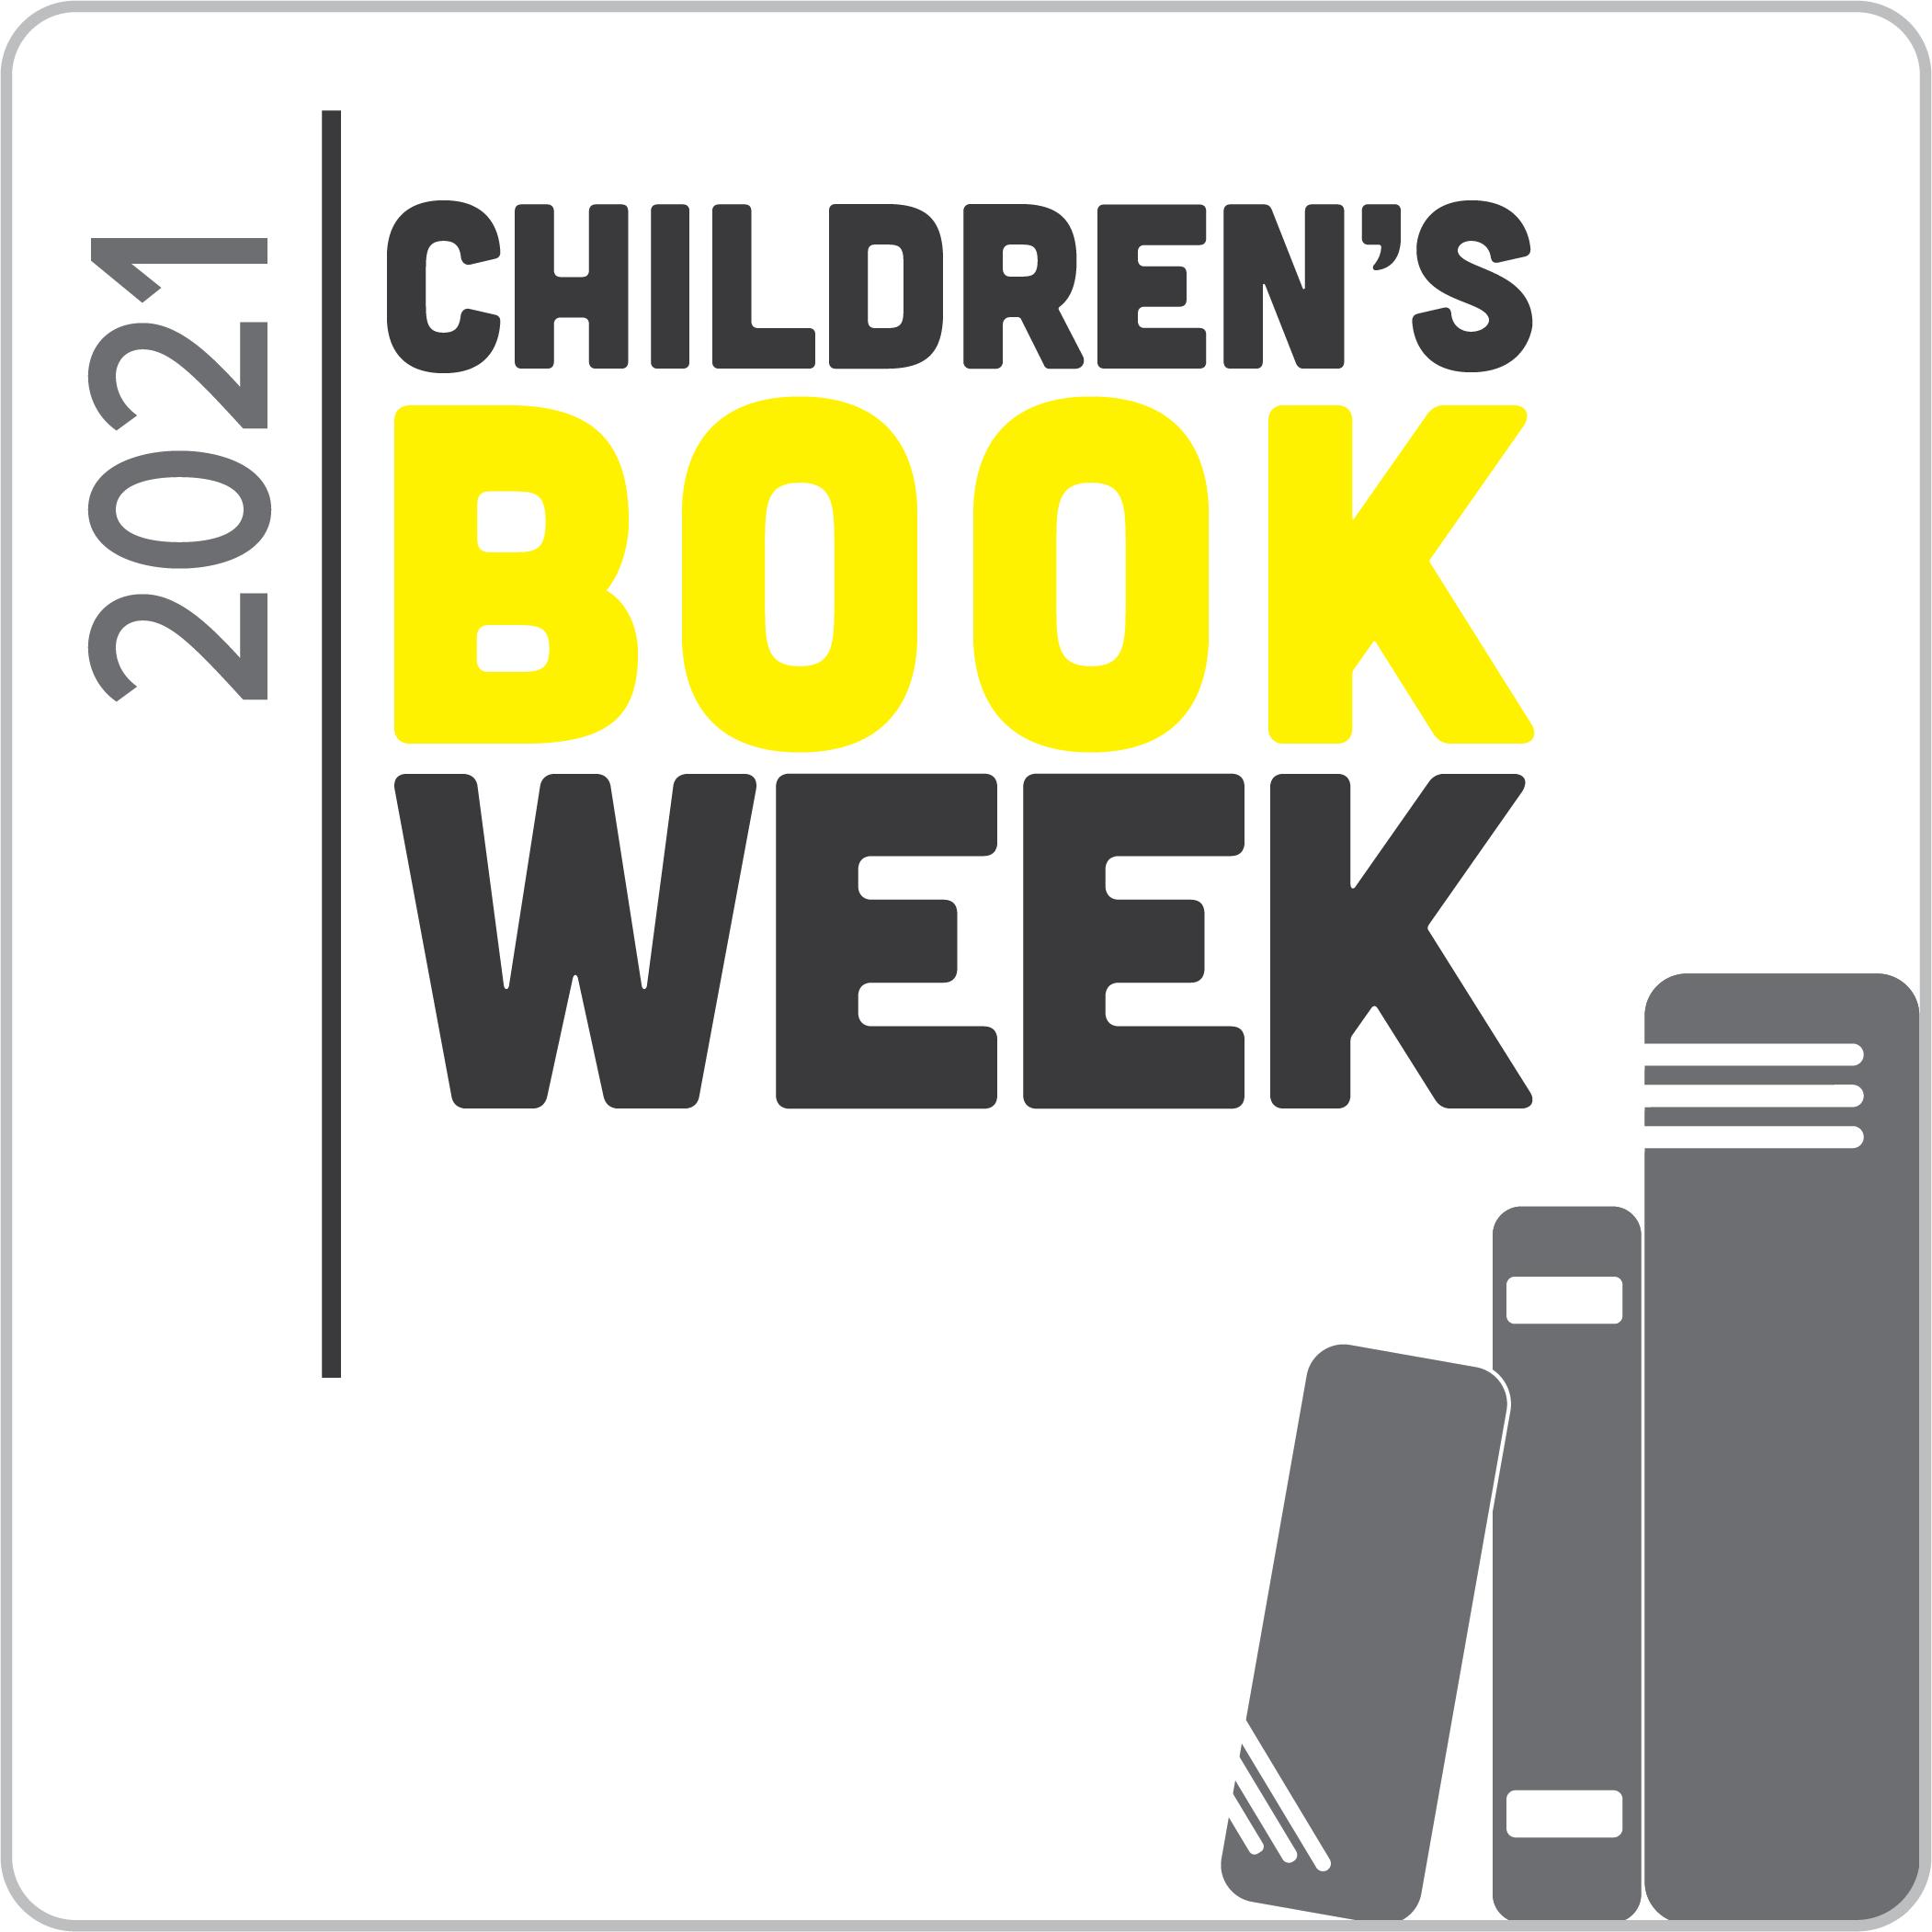 Children's Book Week/Semana de libros para niños